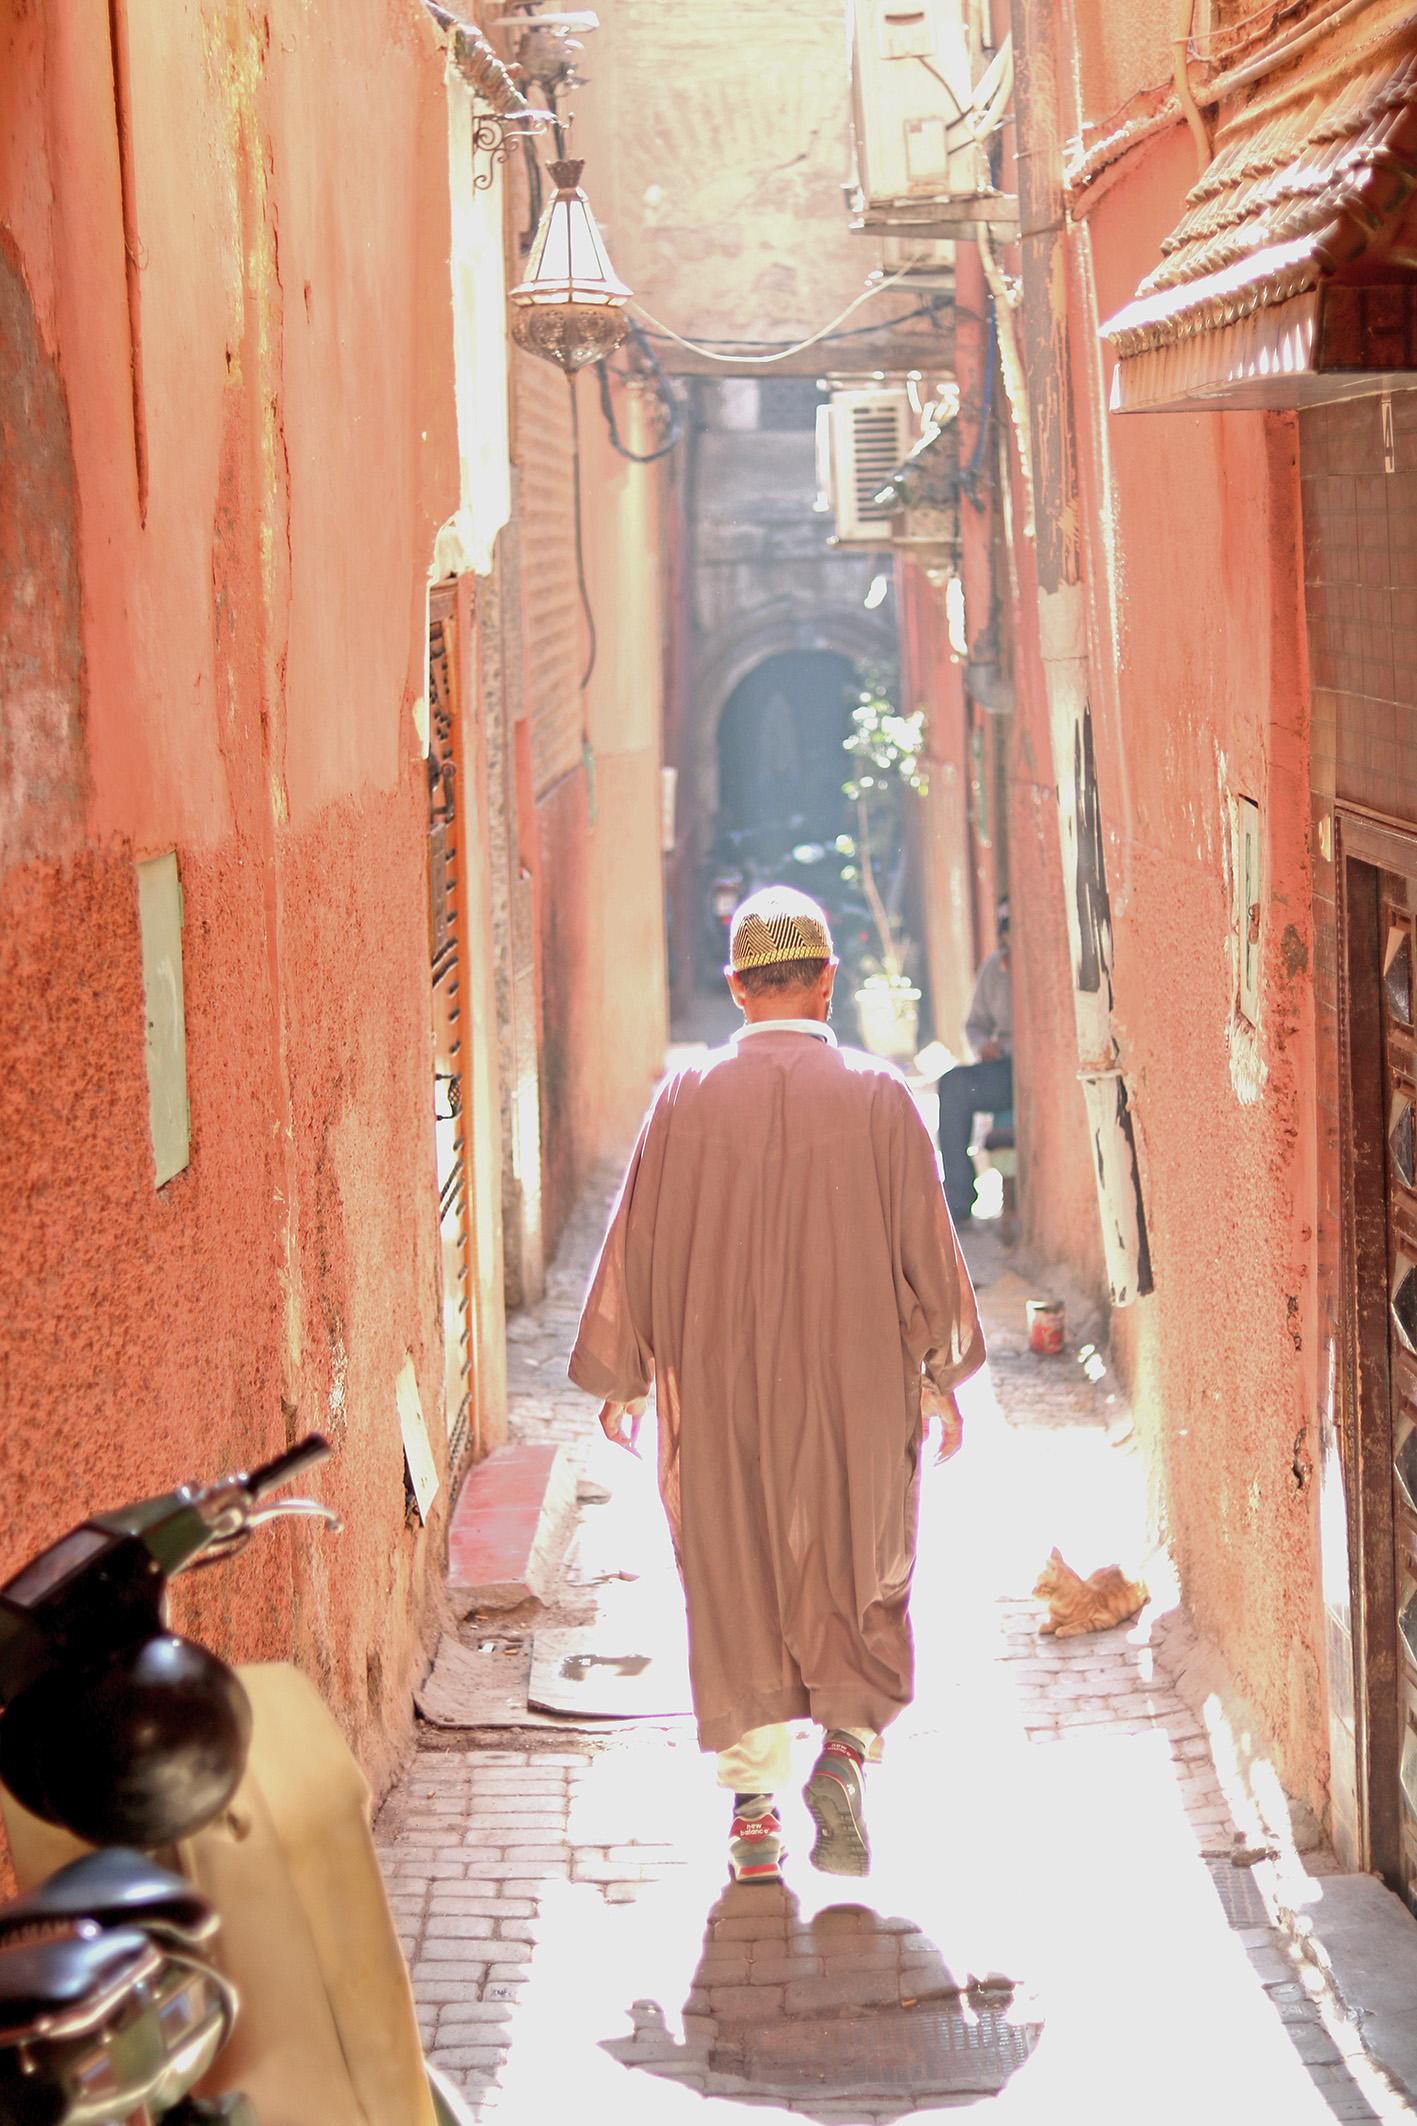 arnaque-guide-marrackech-souk